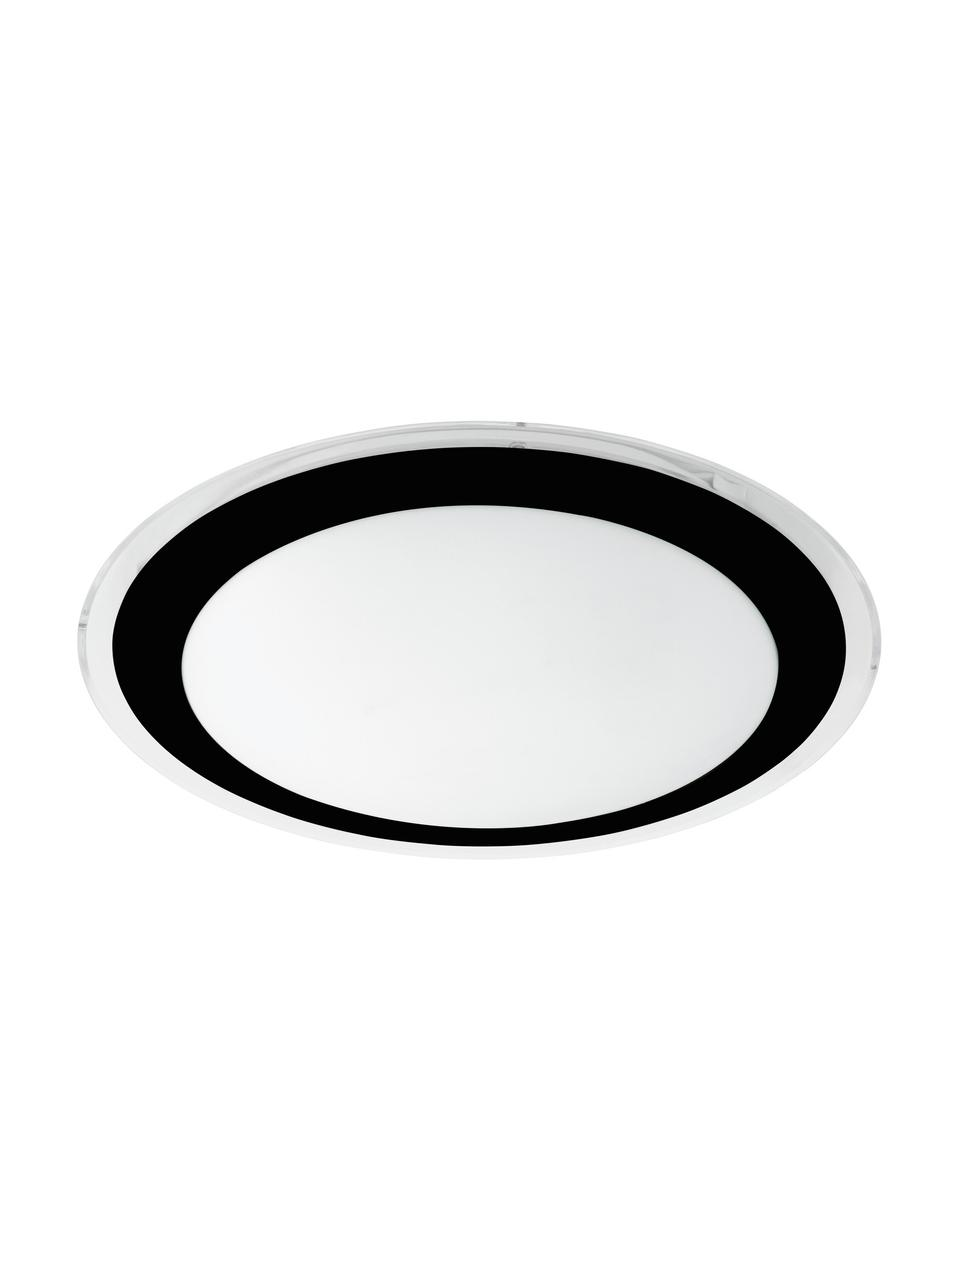 LED-Panel Competa, Lampenschirm: Kunststoff, Baldachin: Kunststoff, Schwarz, Weiß, Ø 34 x H 9 cm